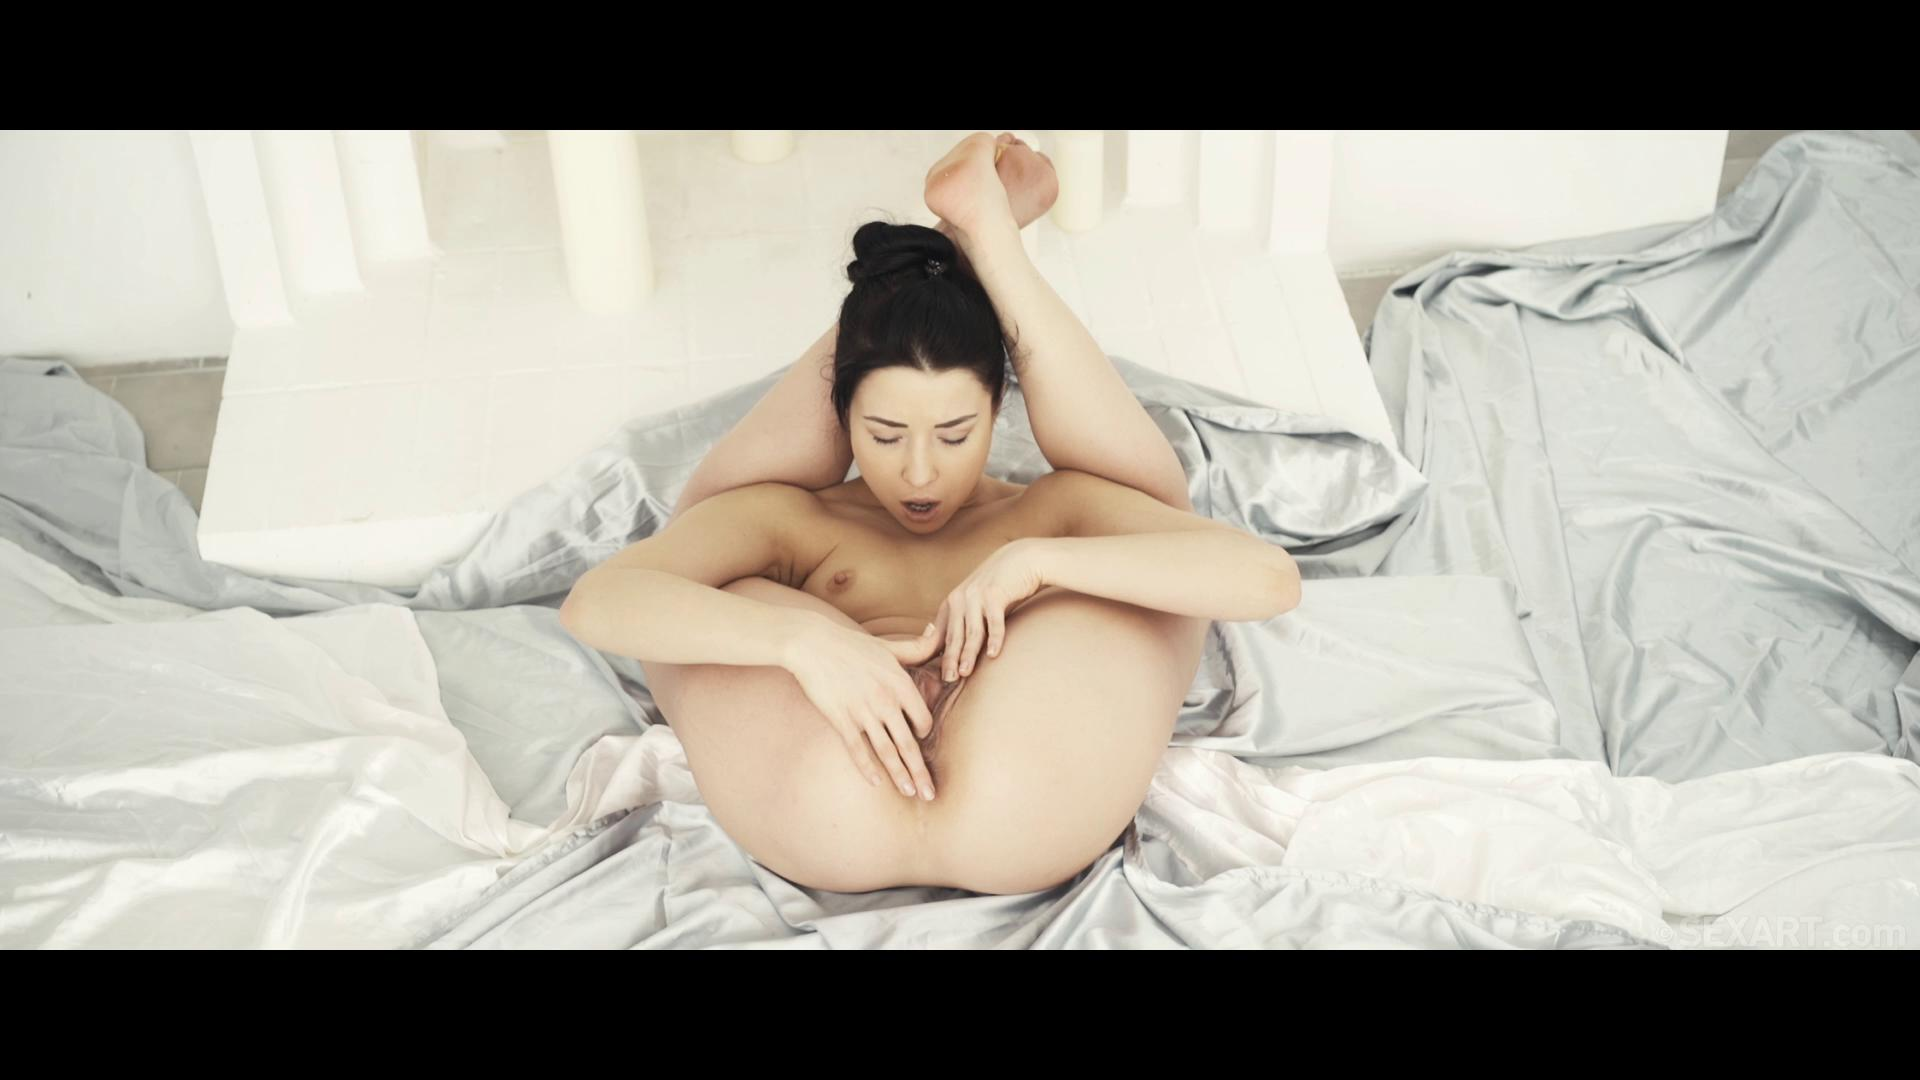 SexArt – Taissia A Yoga Inspiration